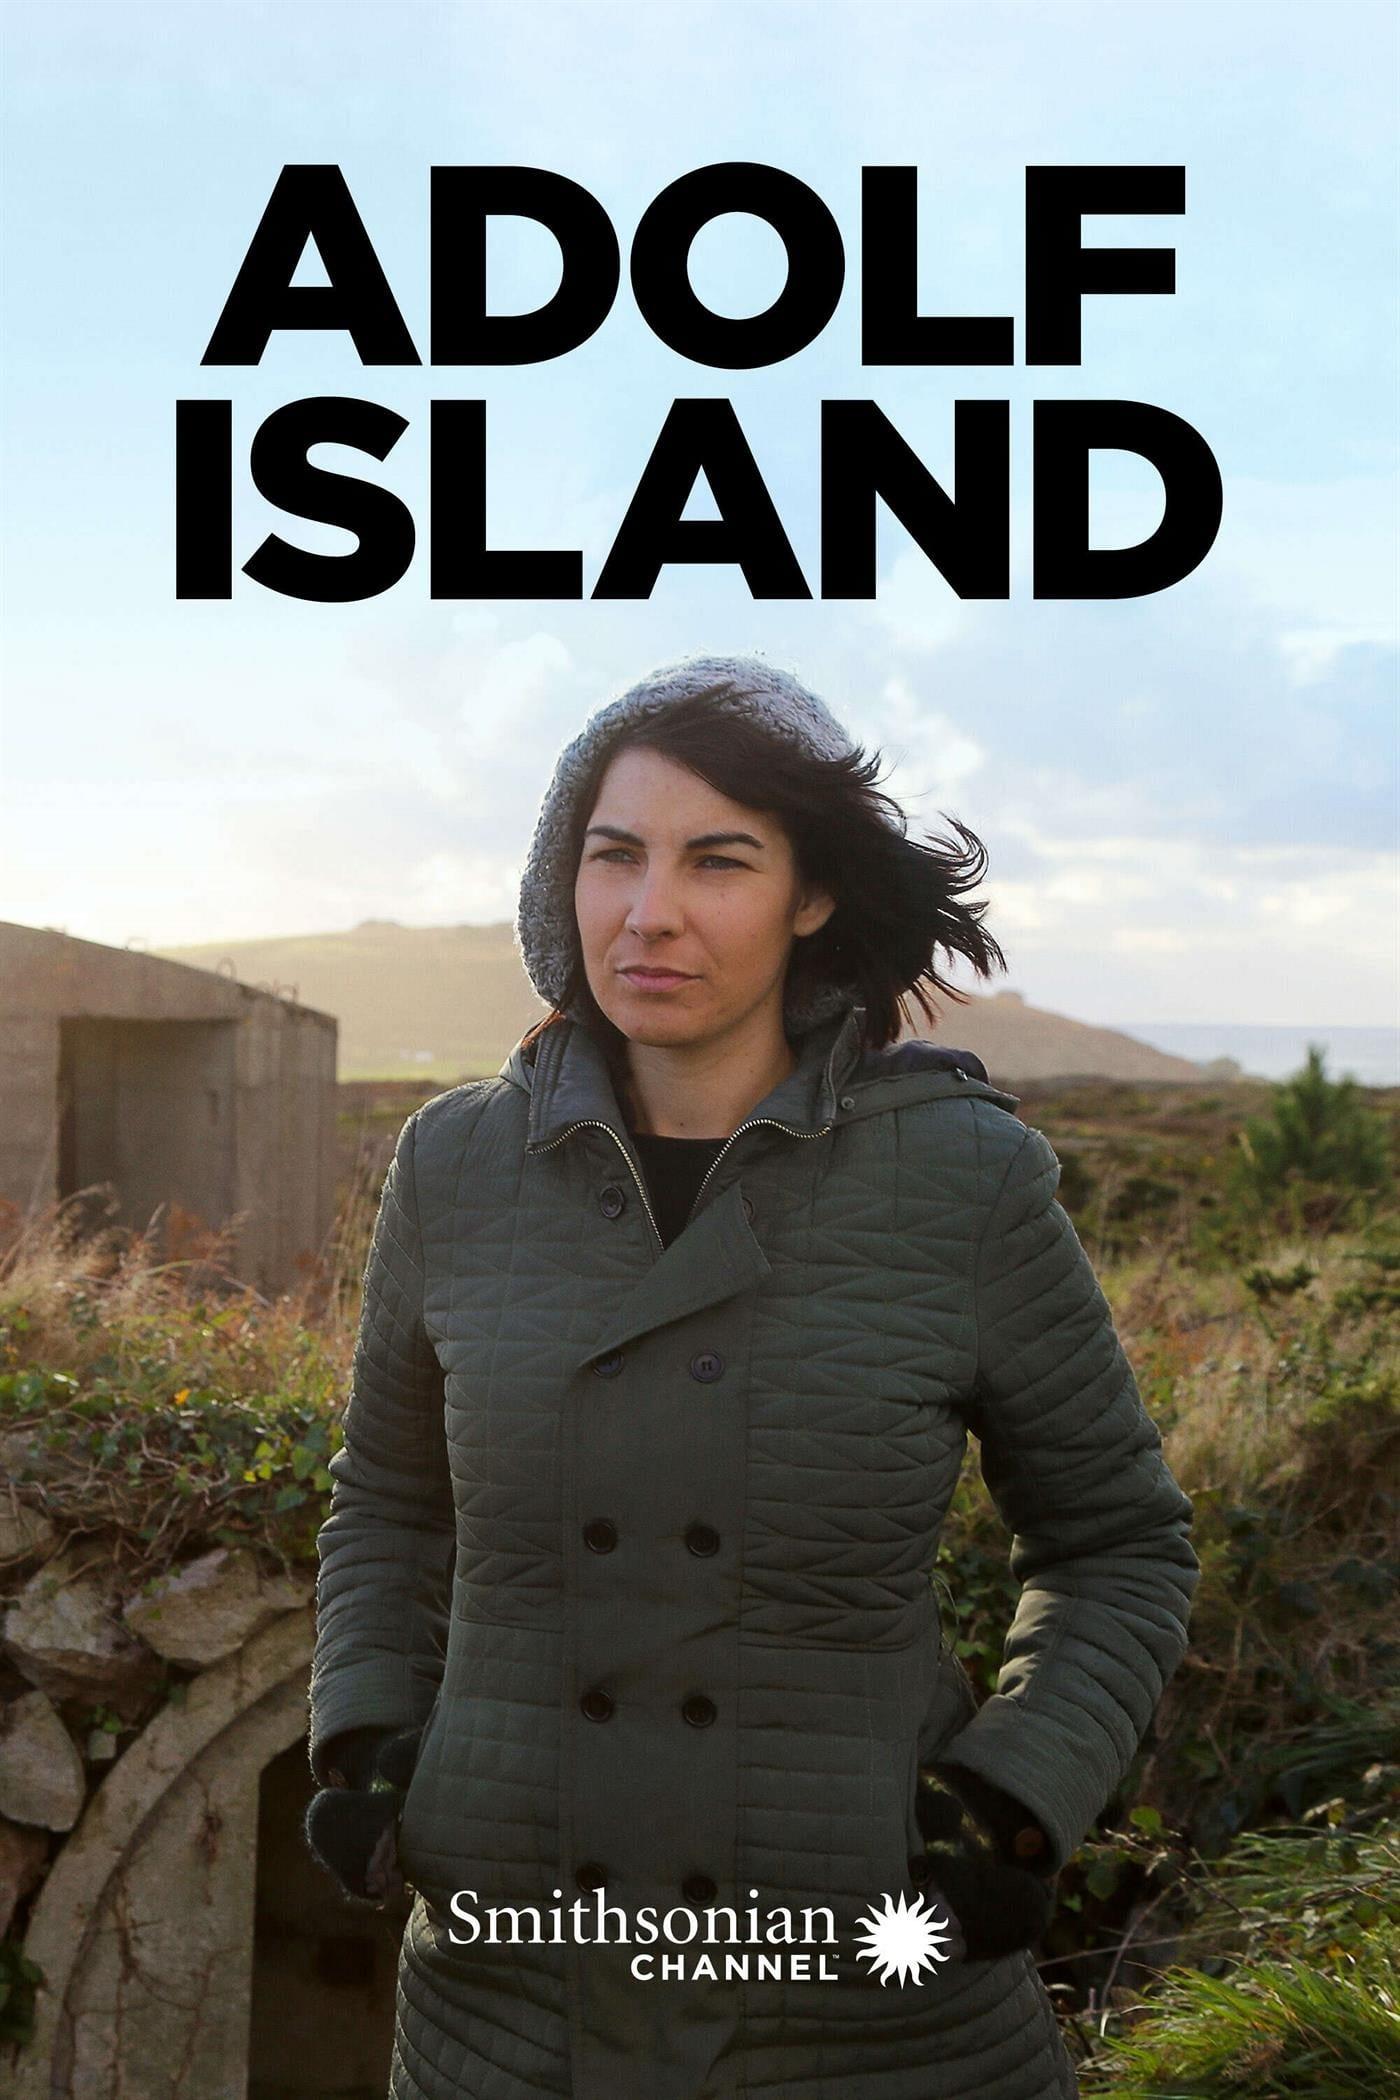 Adolf Island